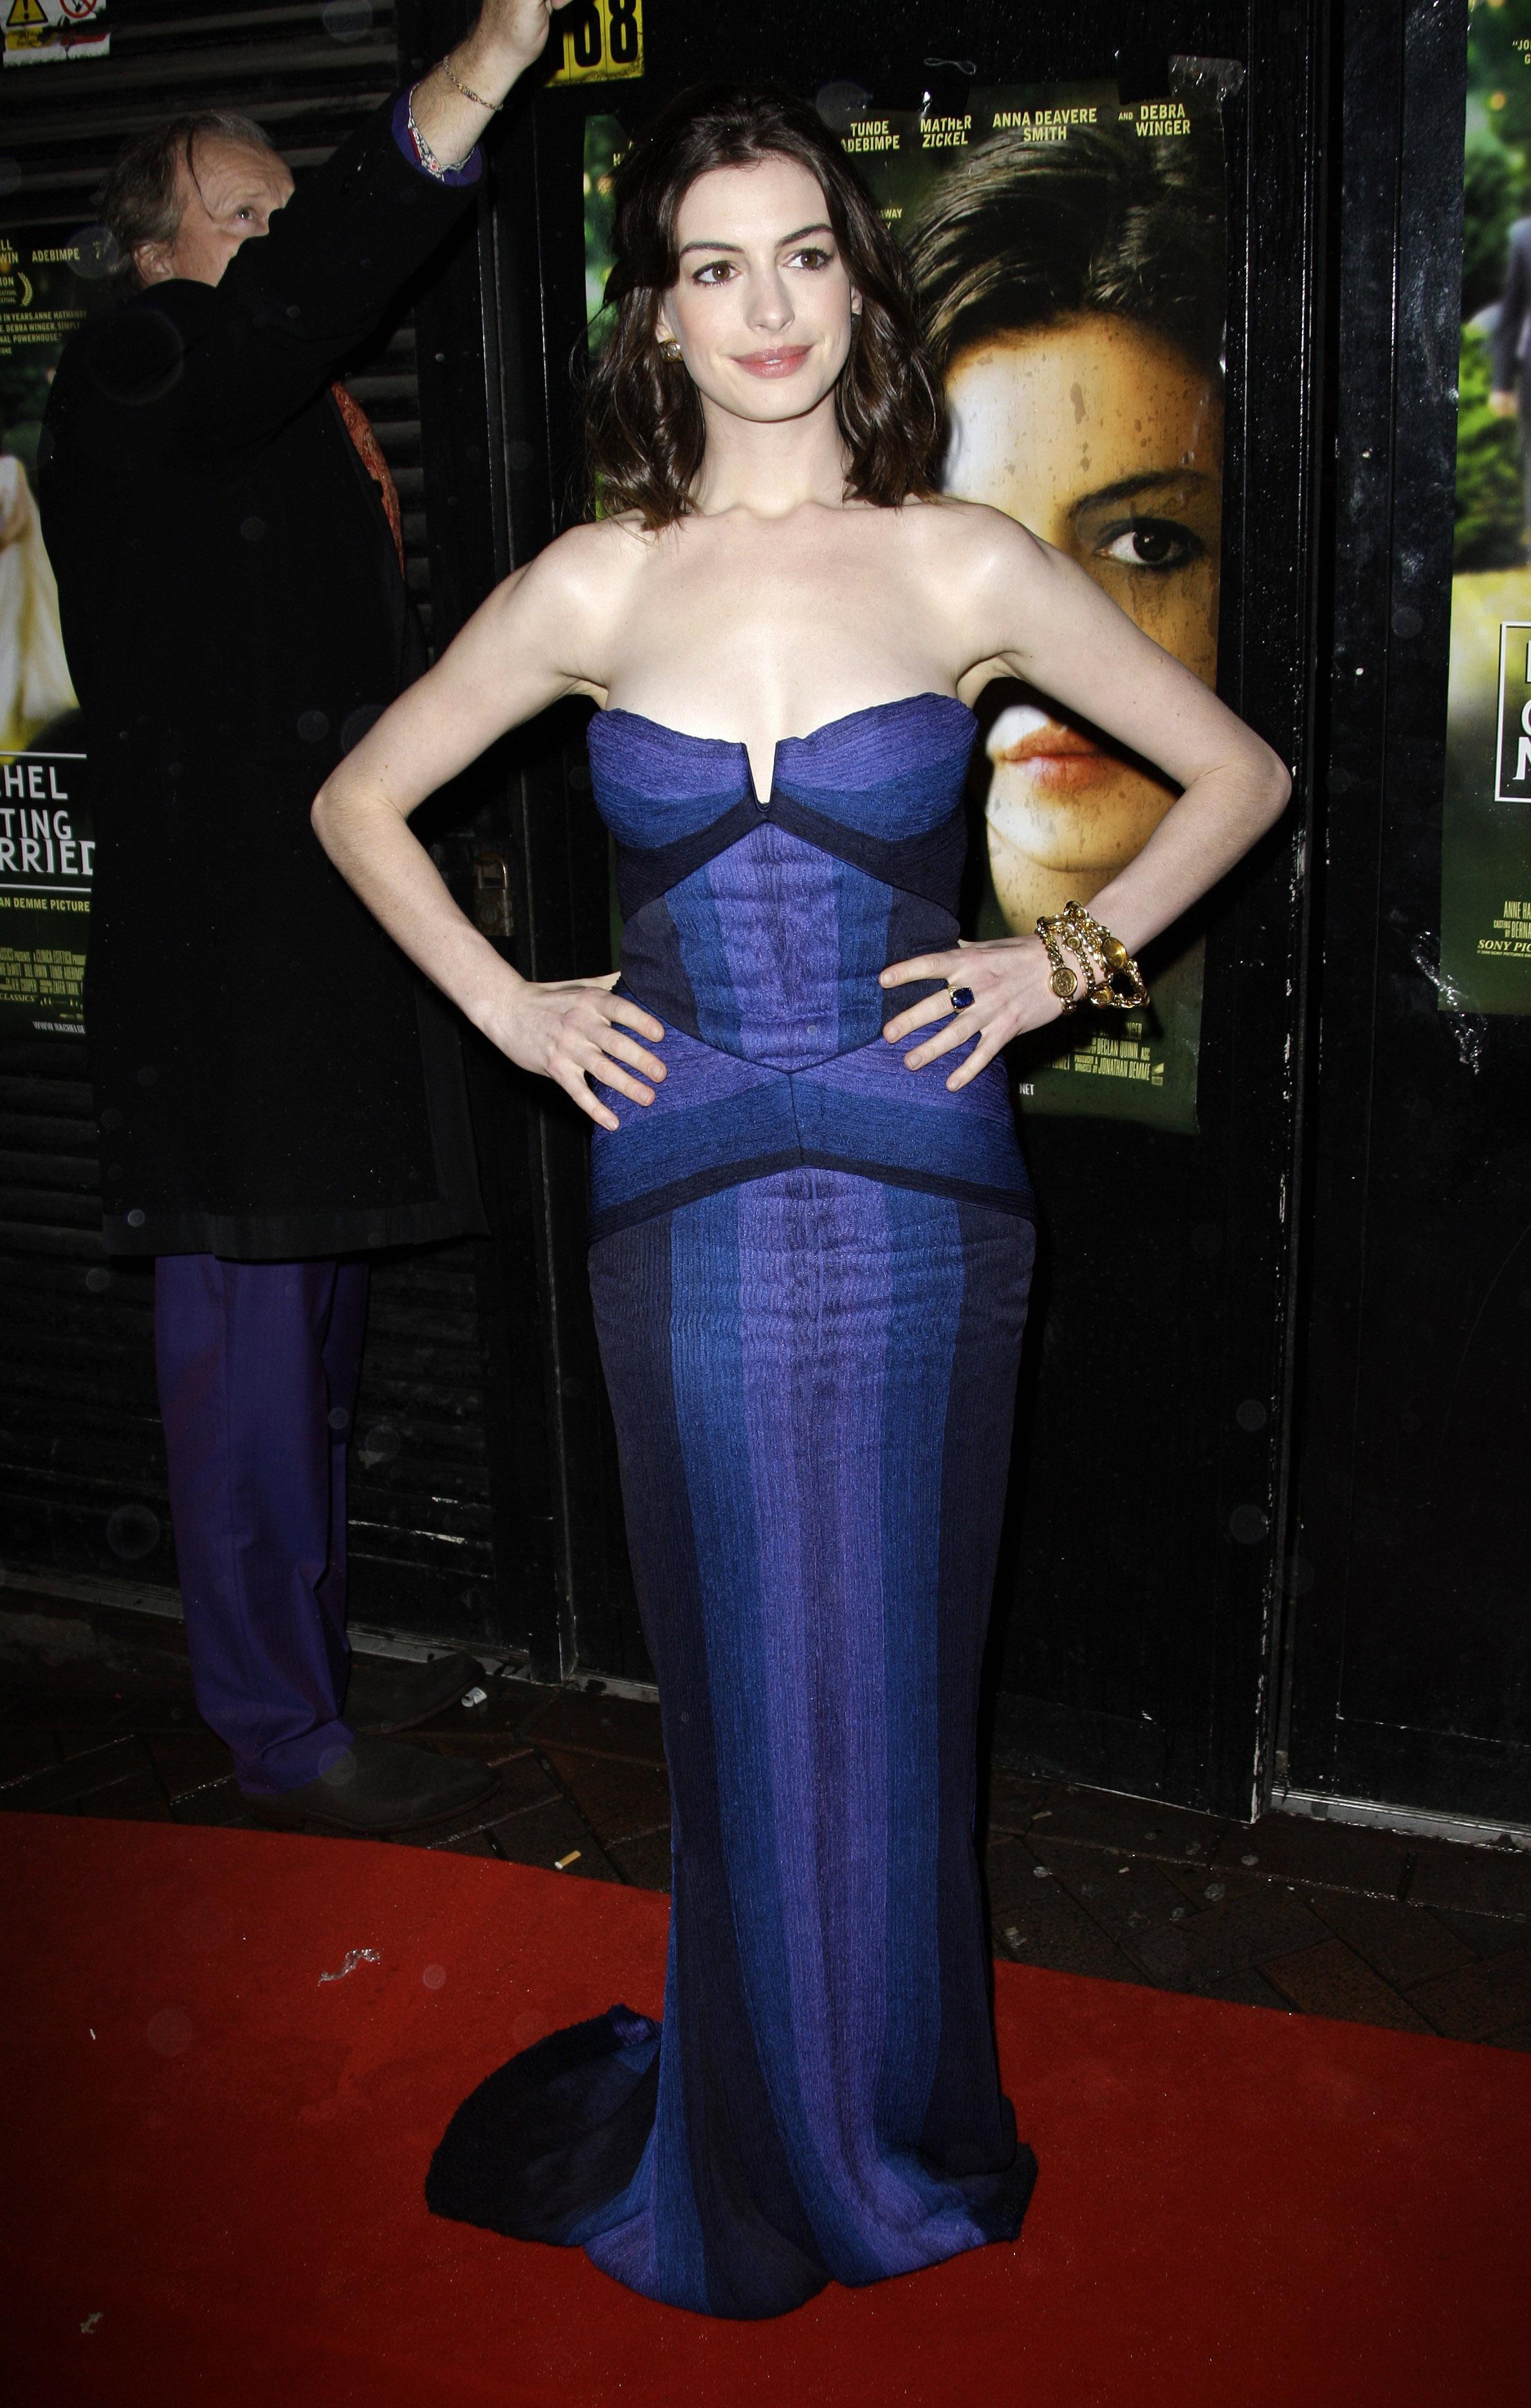 36042_Anne_Hathaway-Rachel_Getting_Married_premiere-007_122_1037lo.jpg